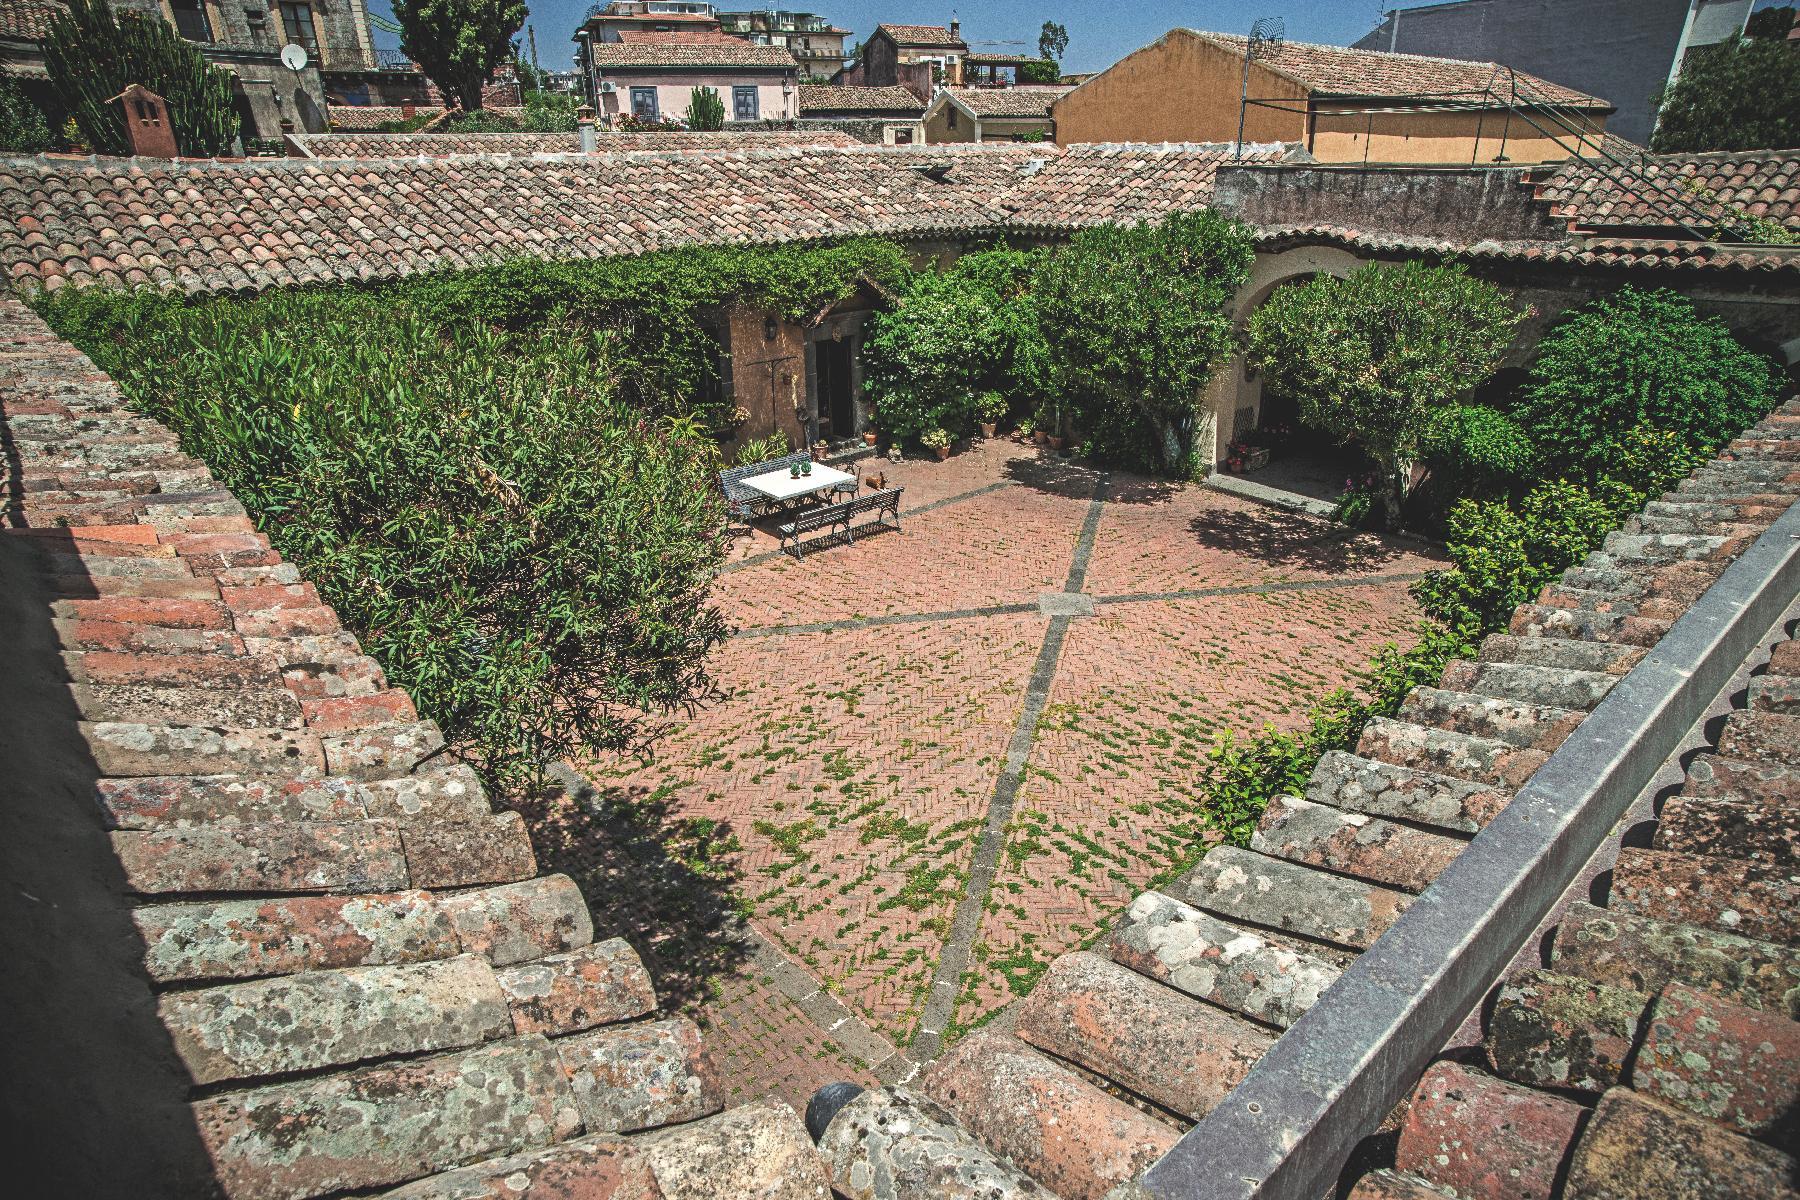 Historische Residenz an den Südhängen des Ätna - 3